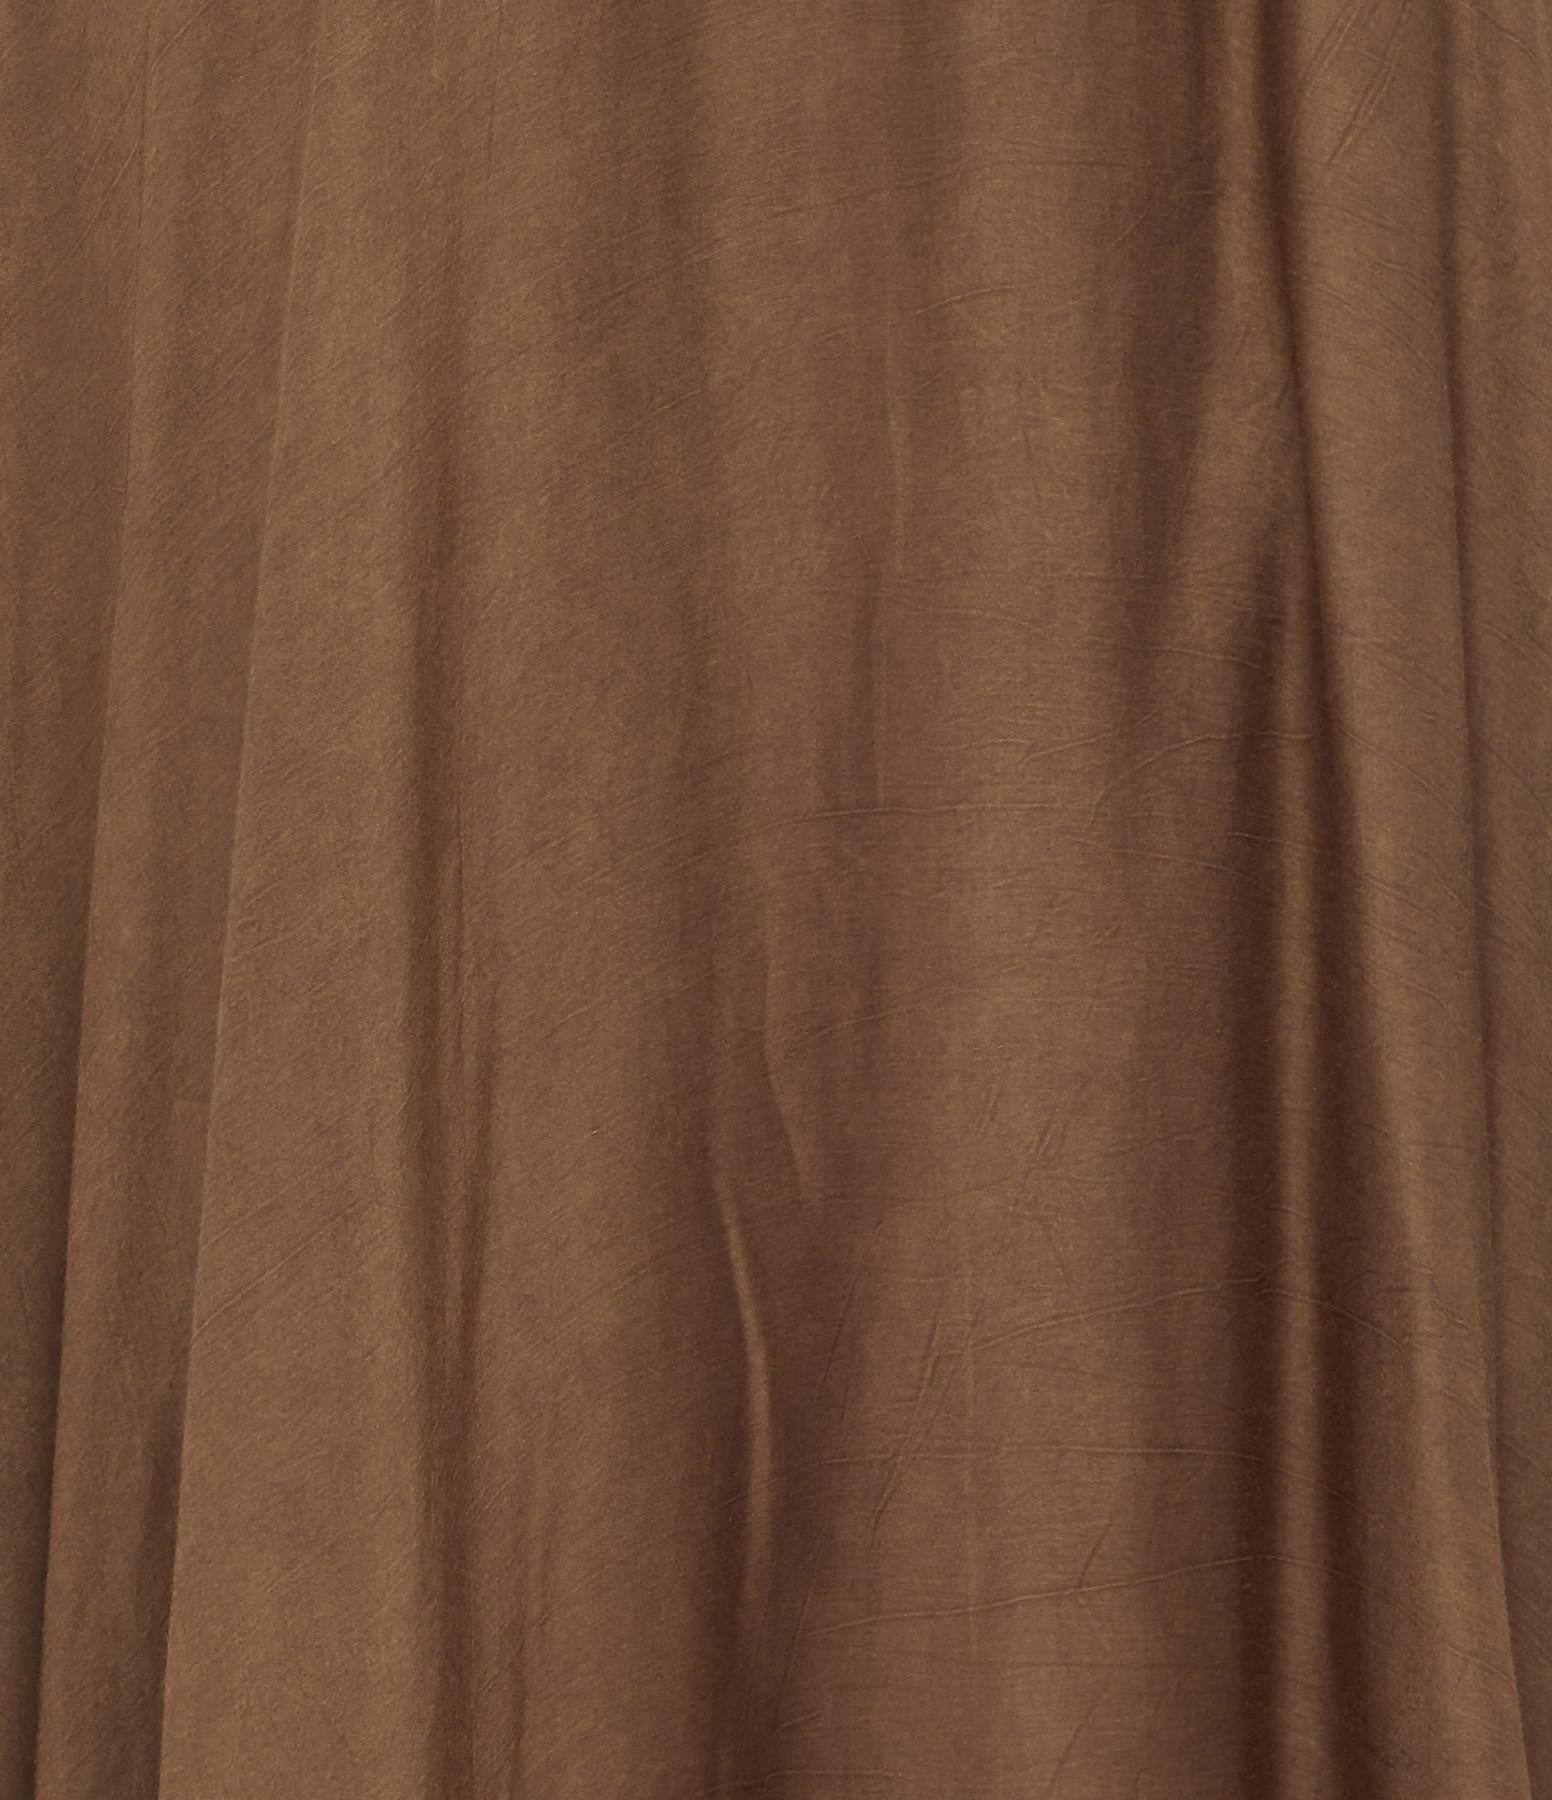 MES DEMOISELLES - Jupe Libre Terracotta